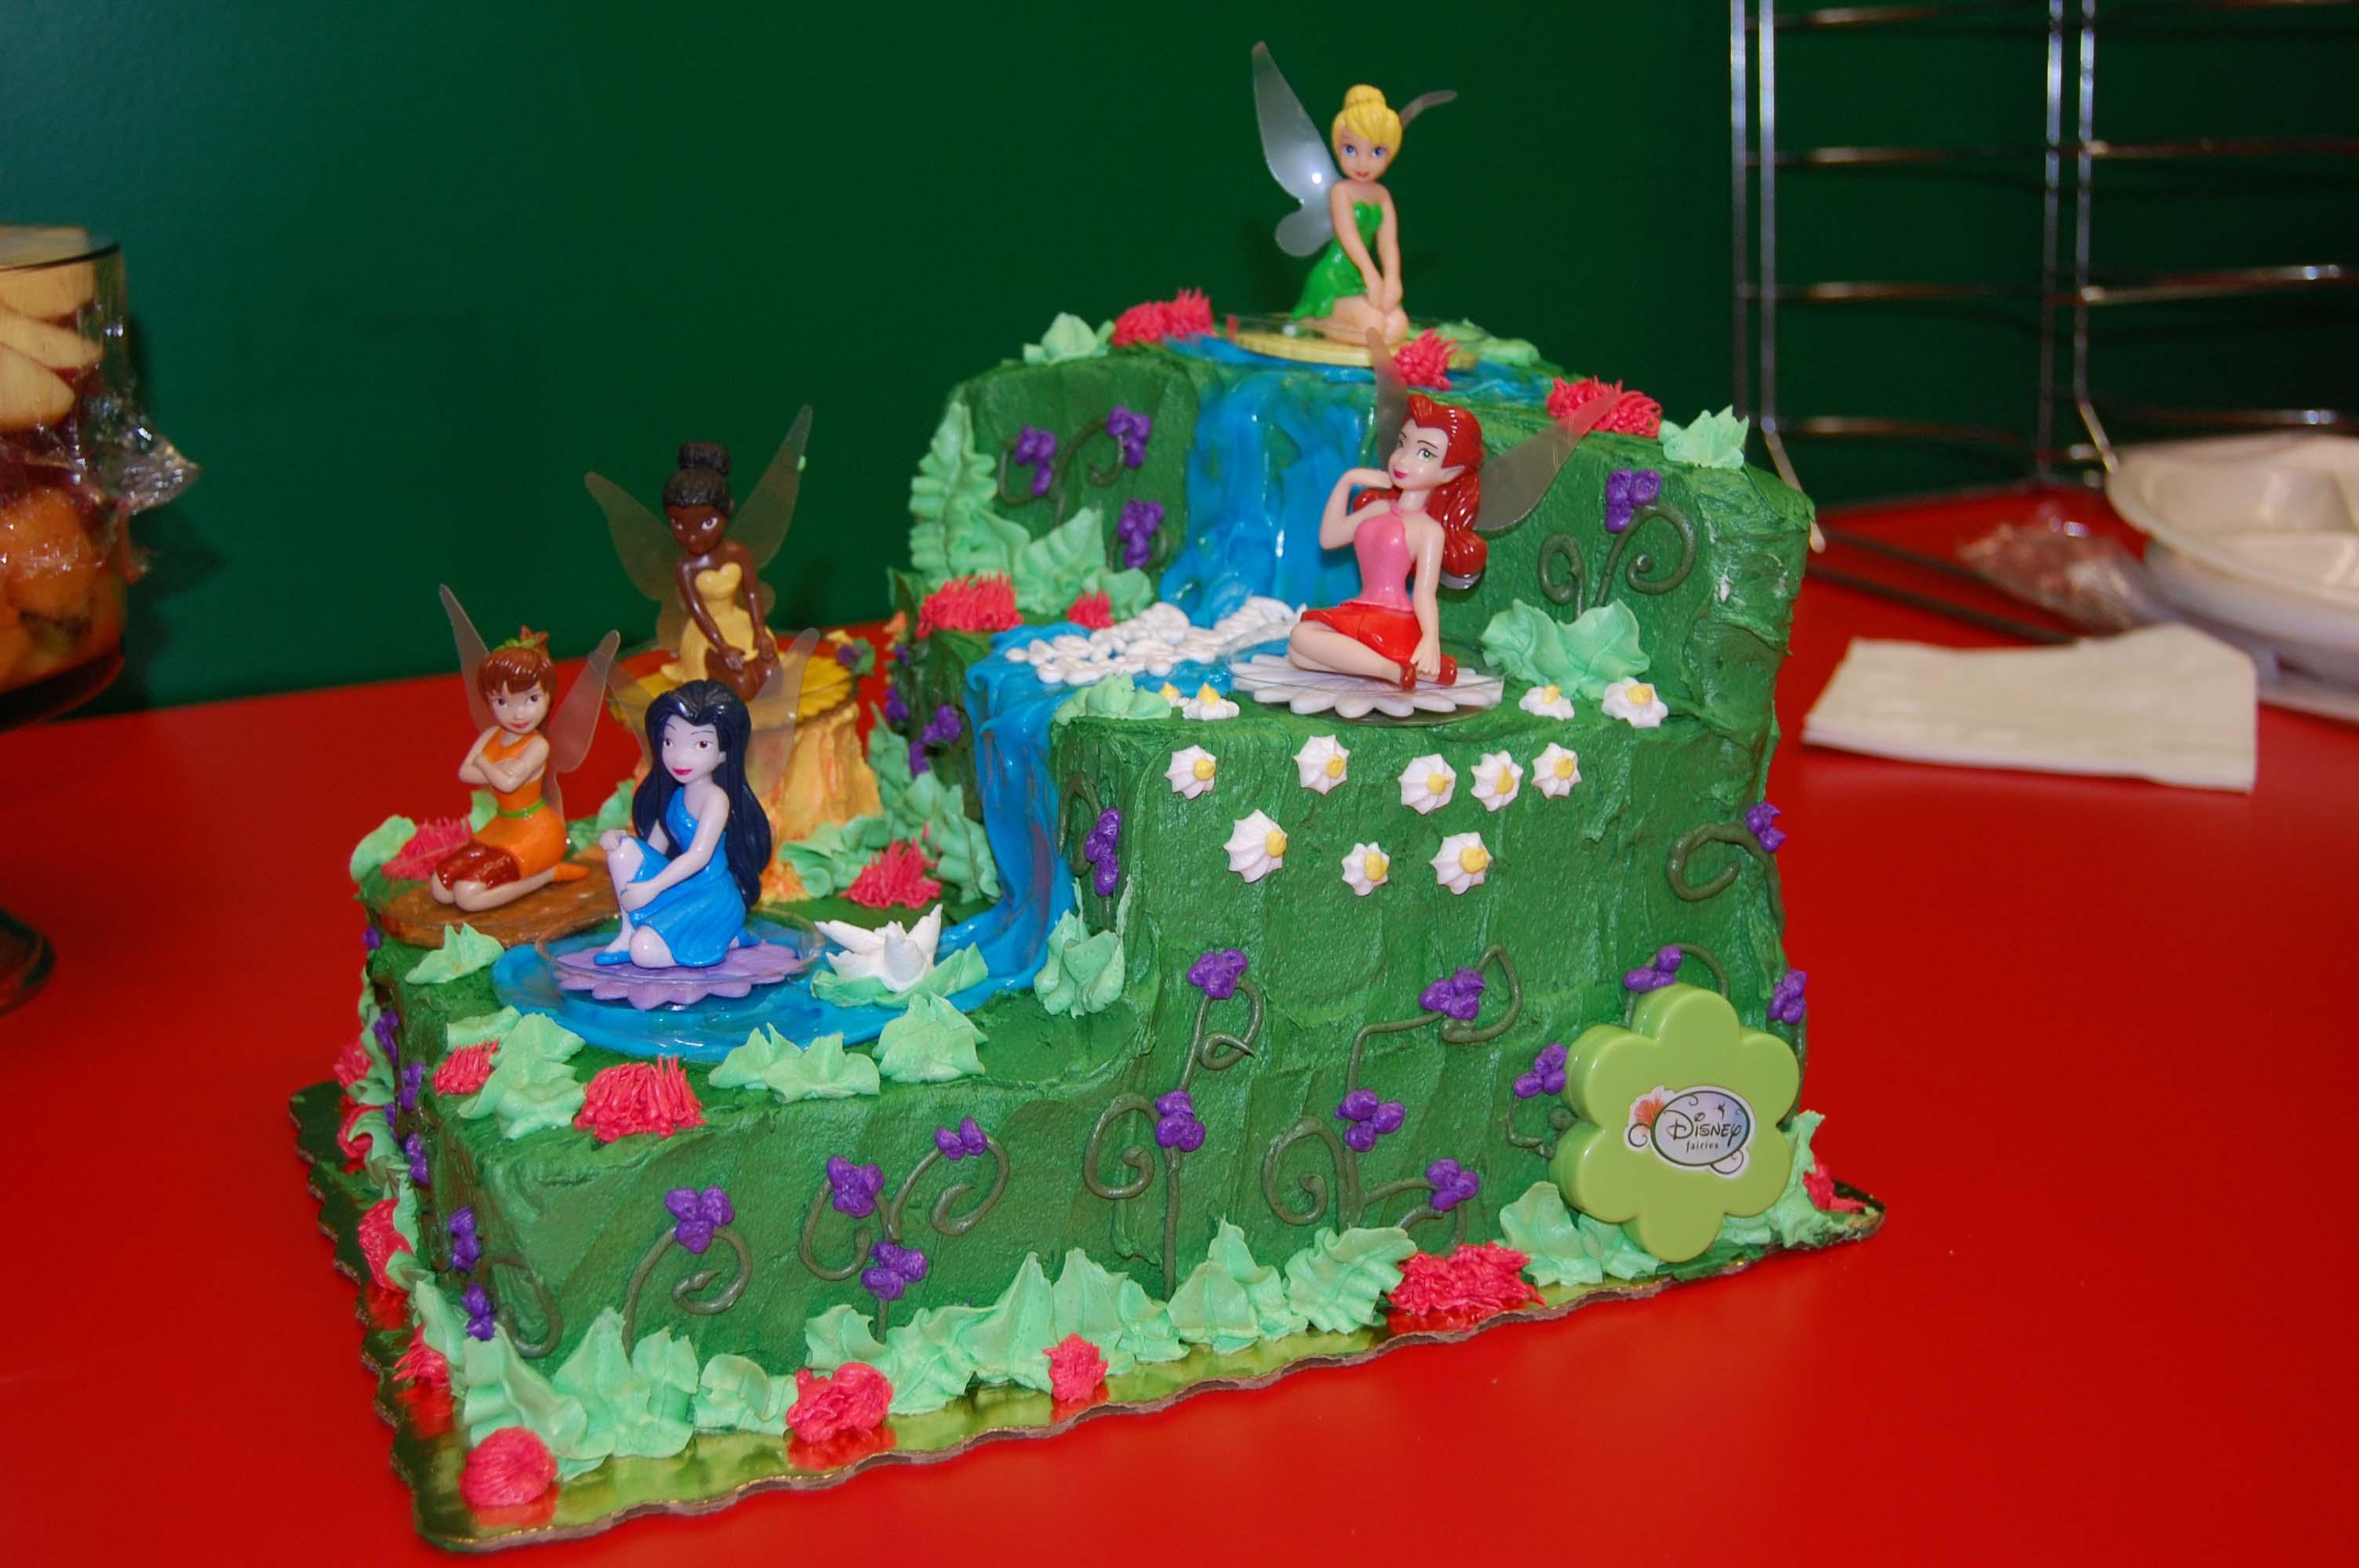 9 Tinkerbell Cakes By Publix Photo Publix Tinkerbell Cake Publix